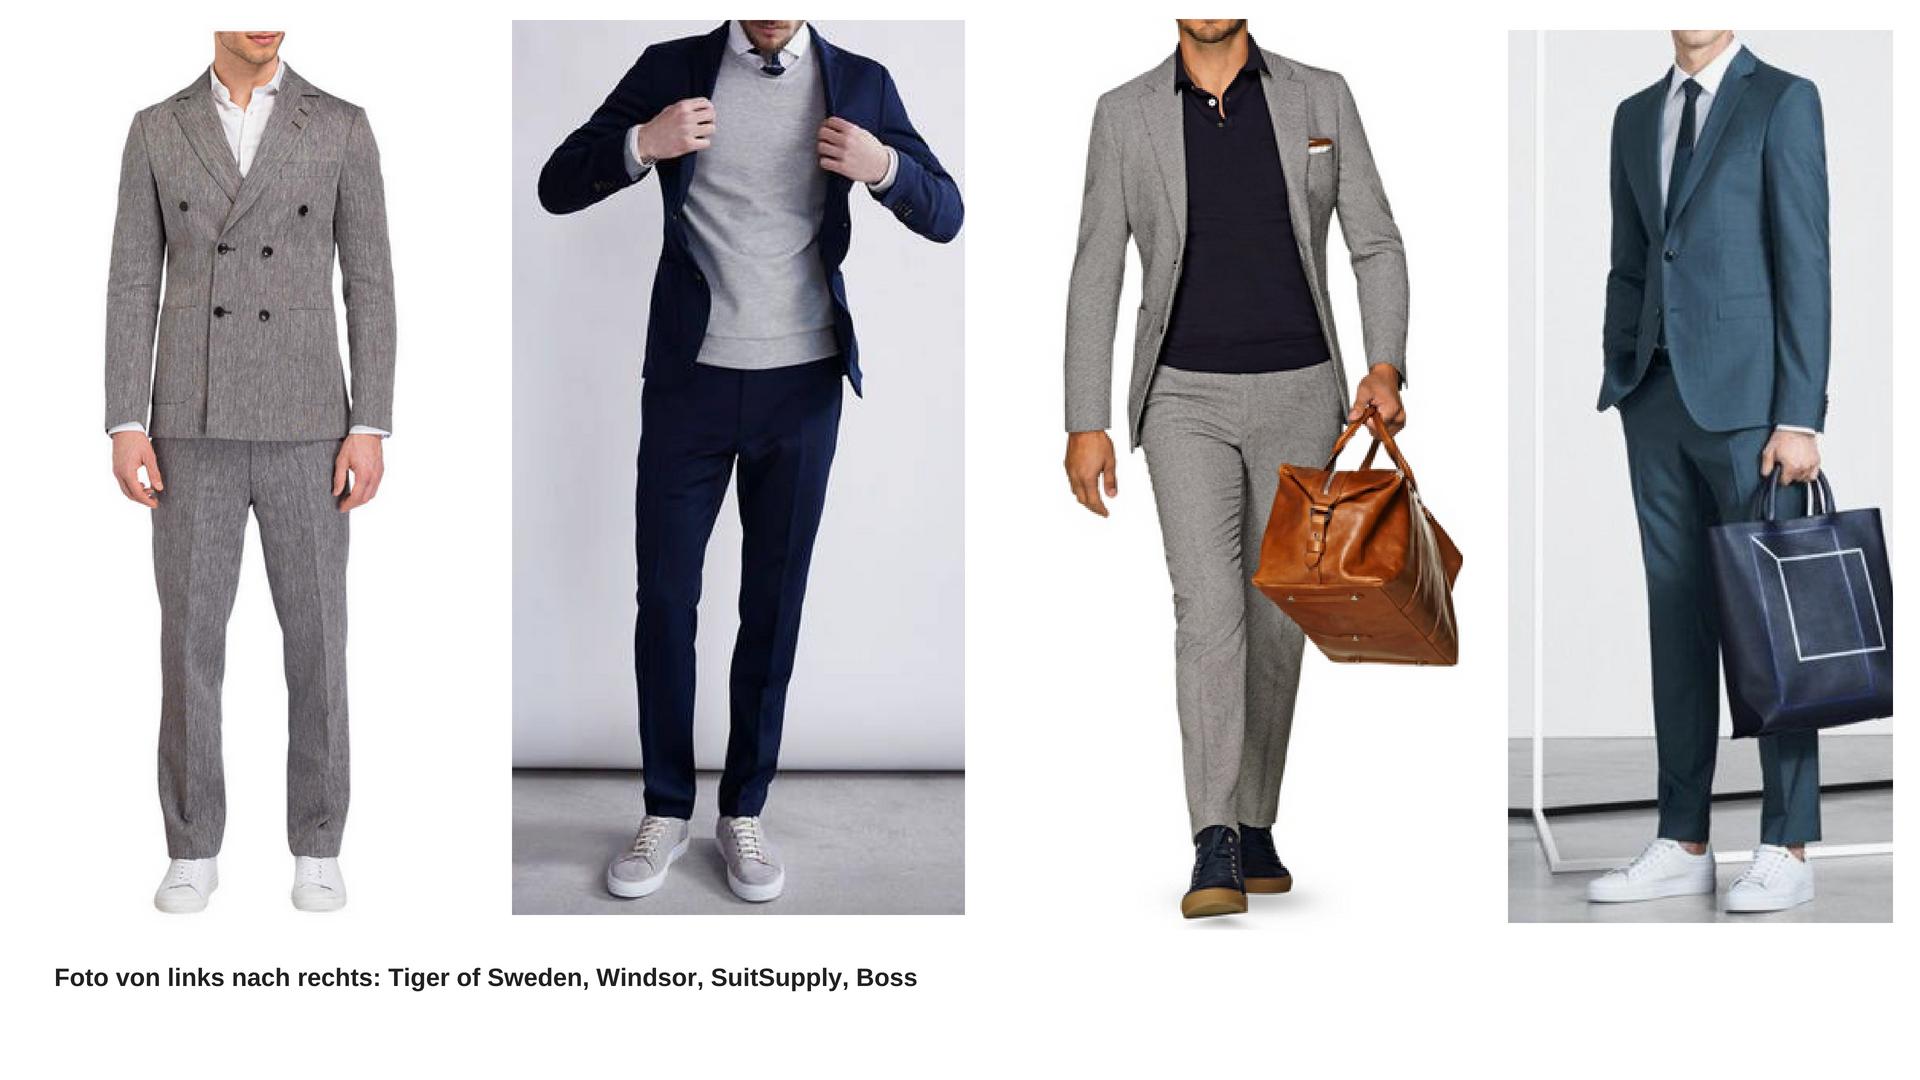 Man Kombiniert Zum Anzug Wie Sneaker 0Nnw8m